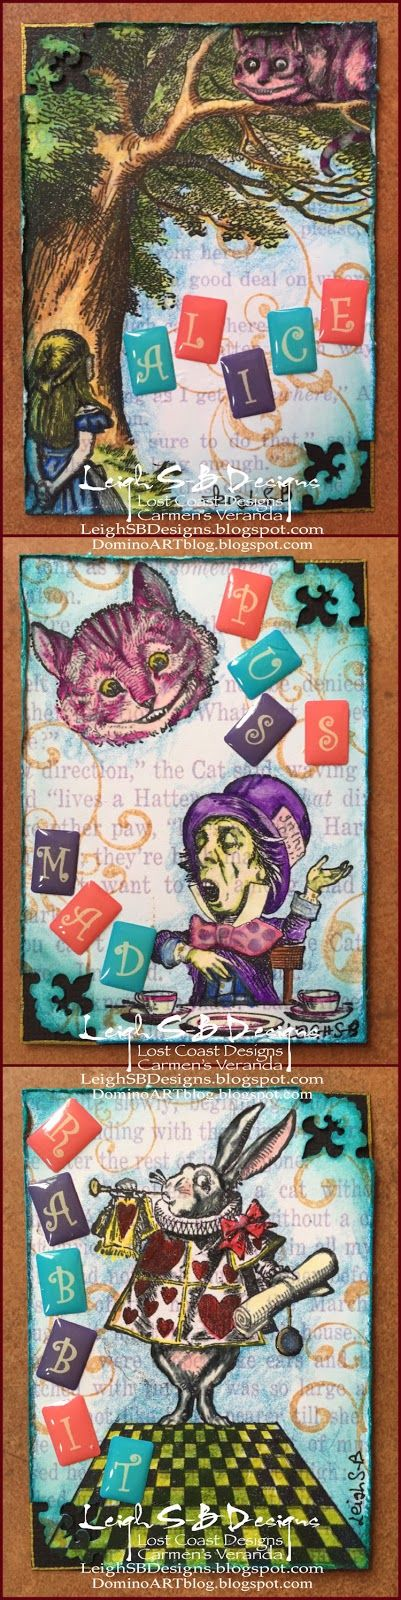 Leigh S-B Designs: Alice in Wonderland Swap!